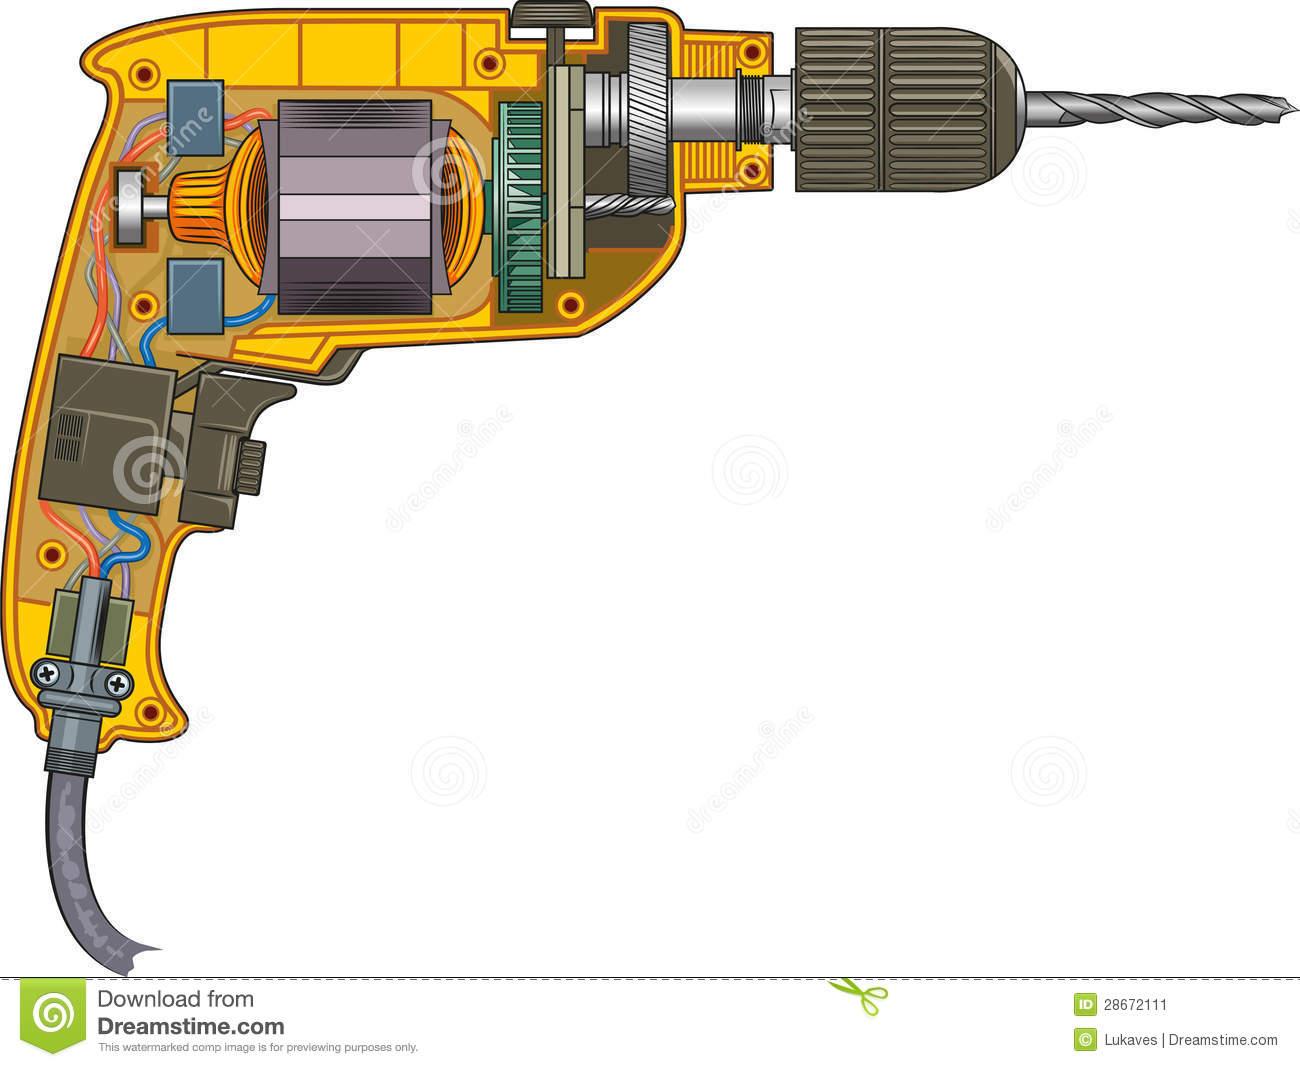 Drilling Machine Stock Image.